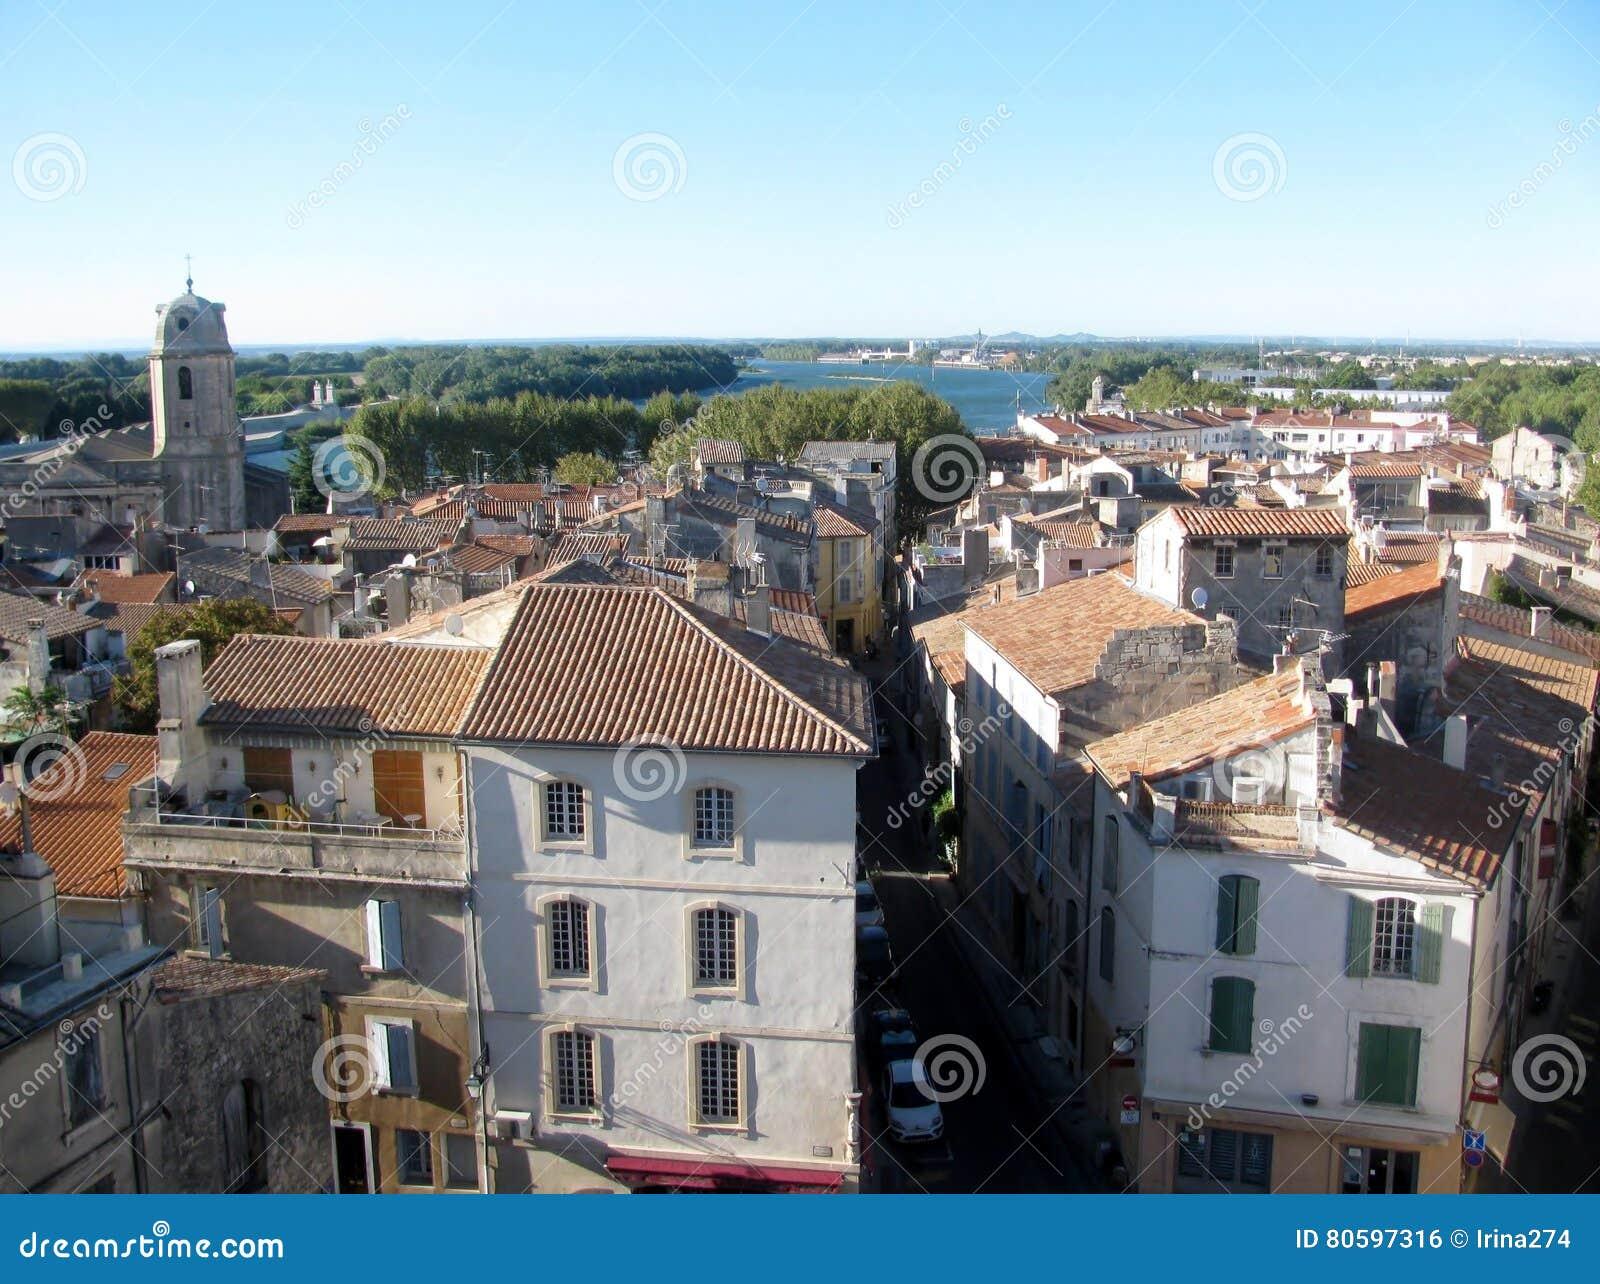 Flyg- sikt på den gamla staden av Arles, Frankrike